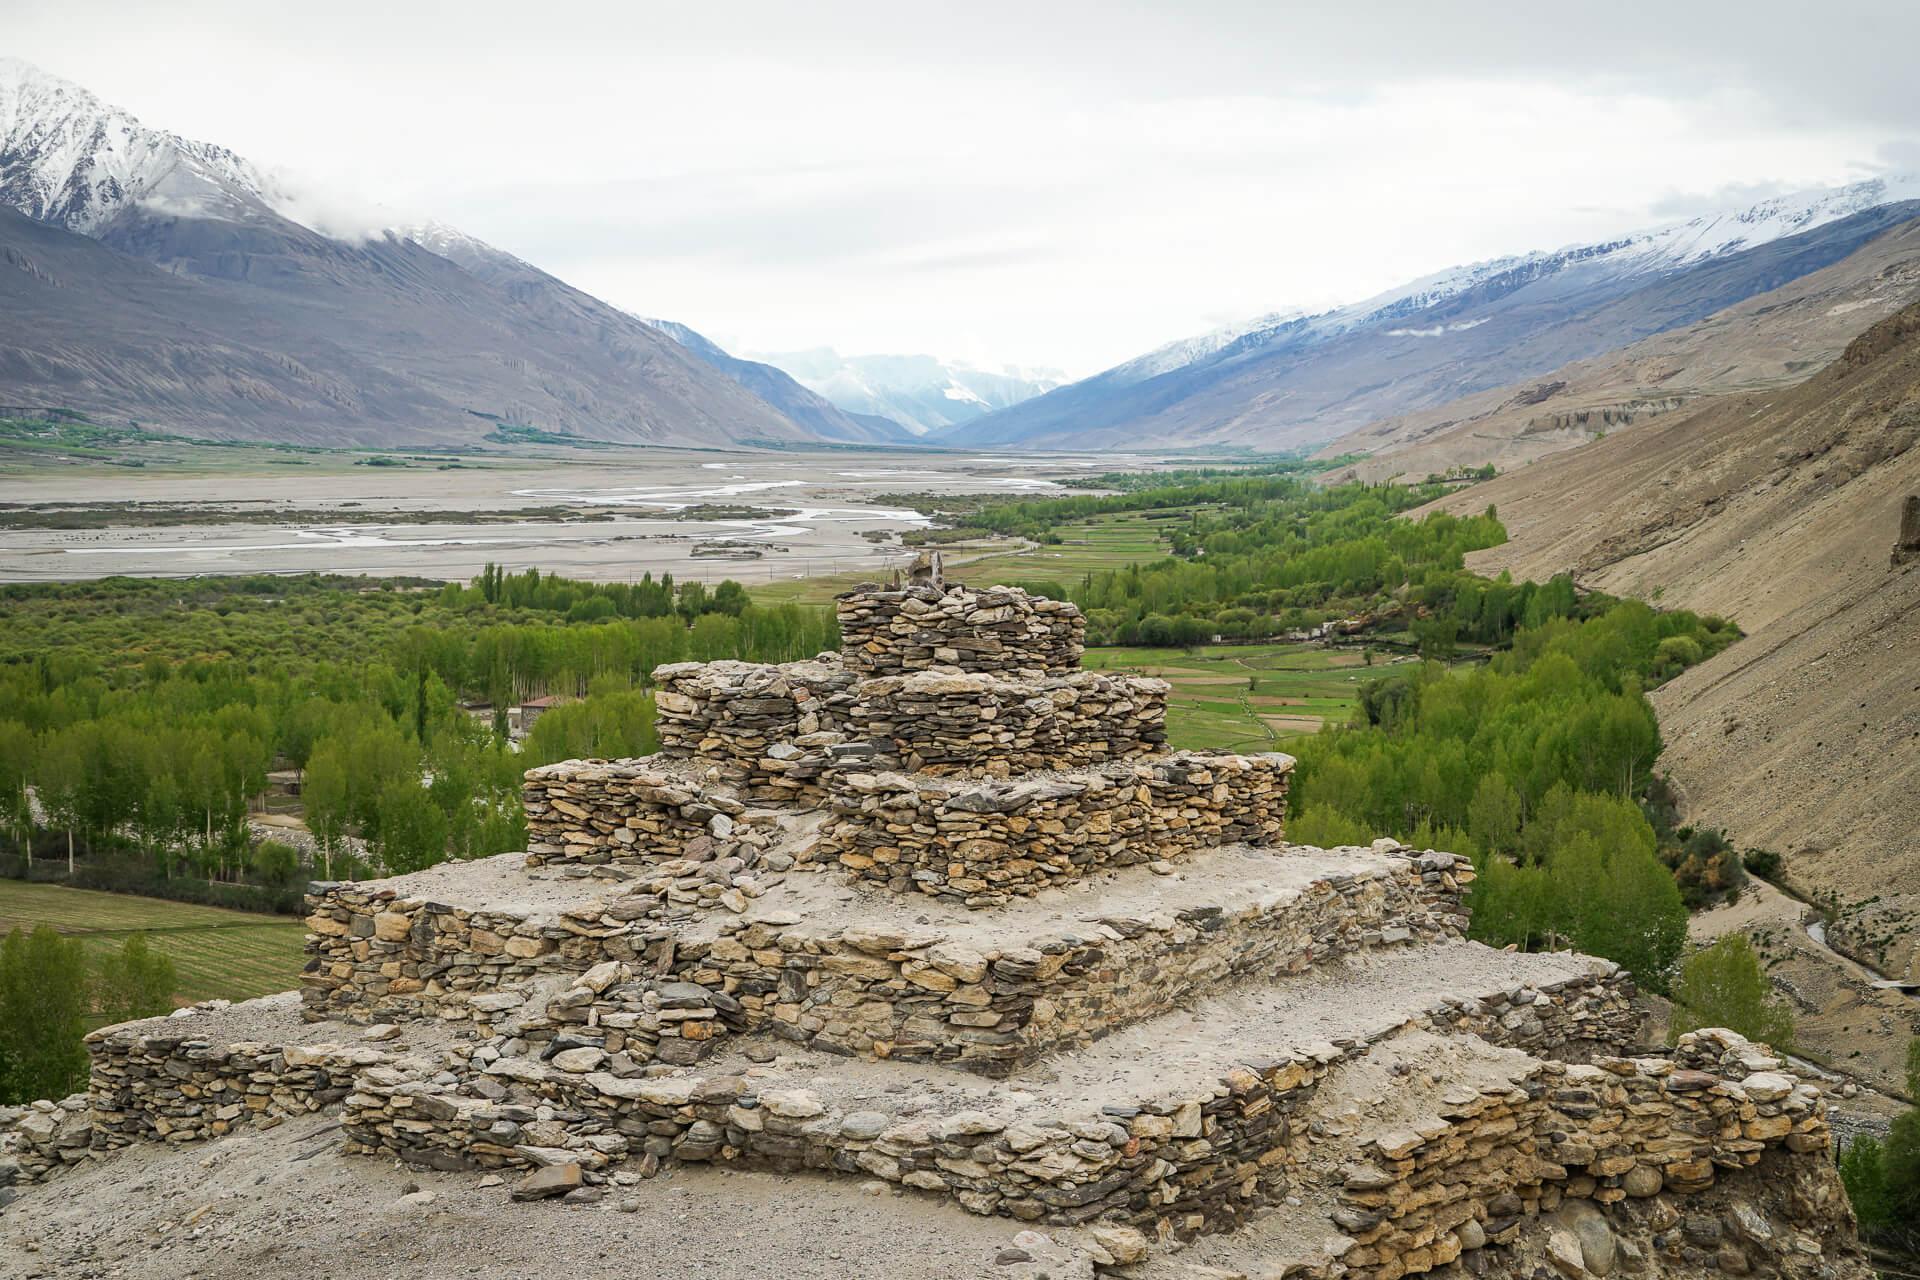 Buddhist stupa in Tajiksitan during Pamir highway